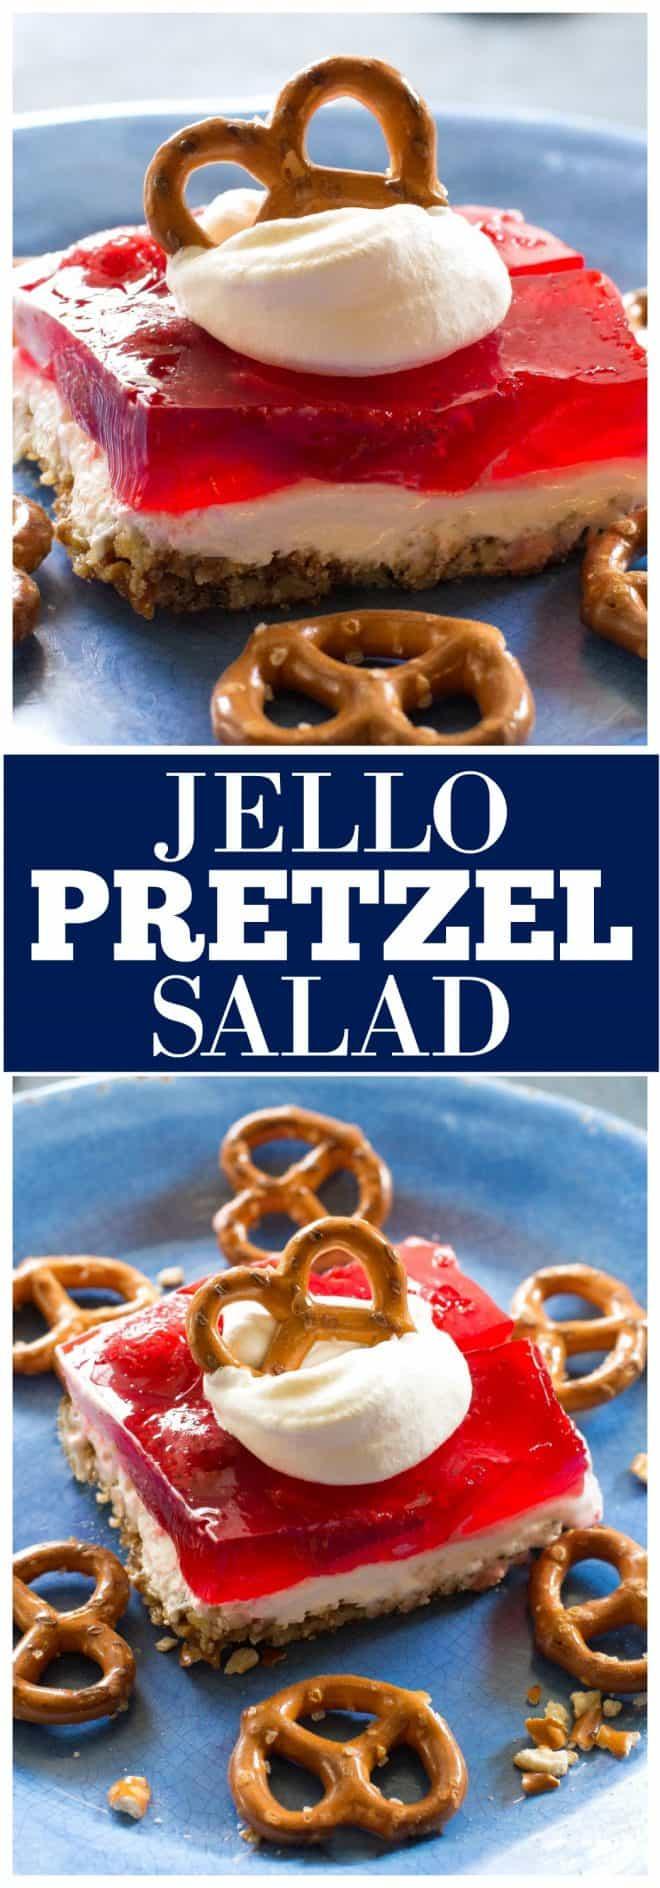 Jello Pretzel salad